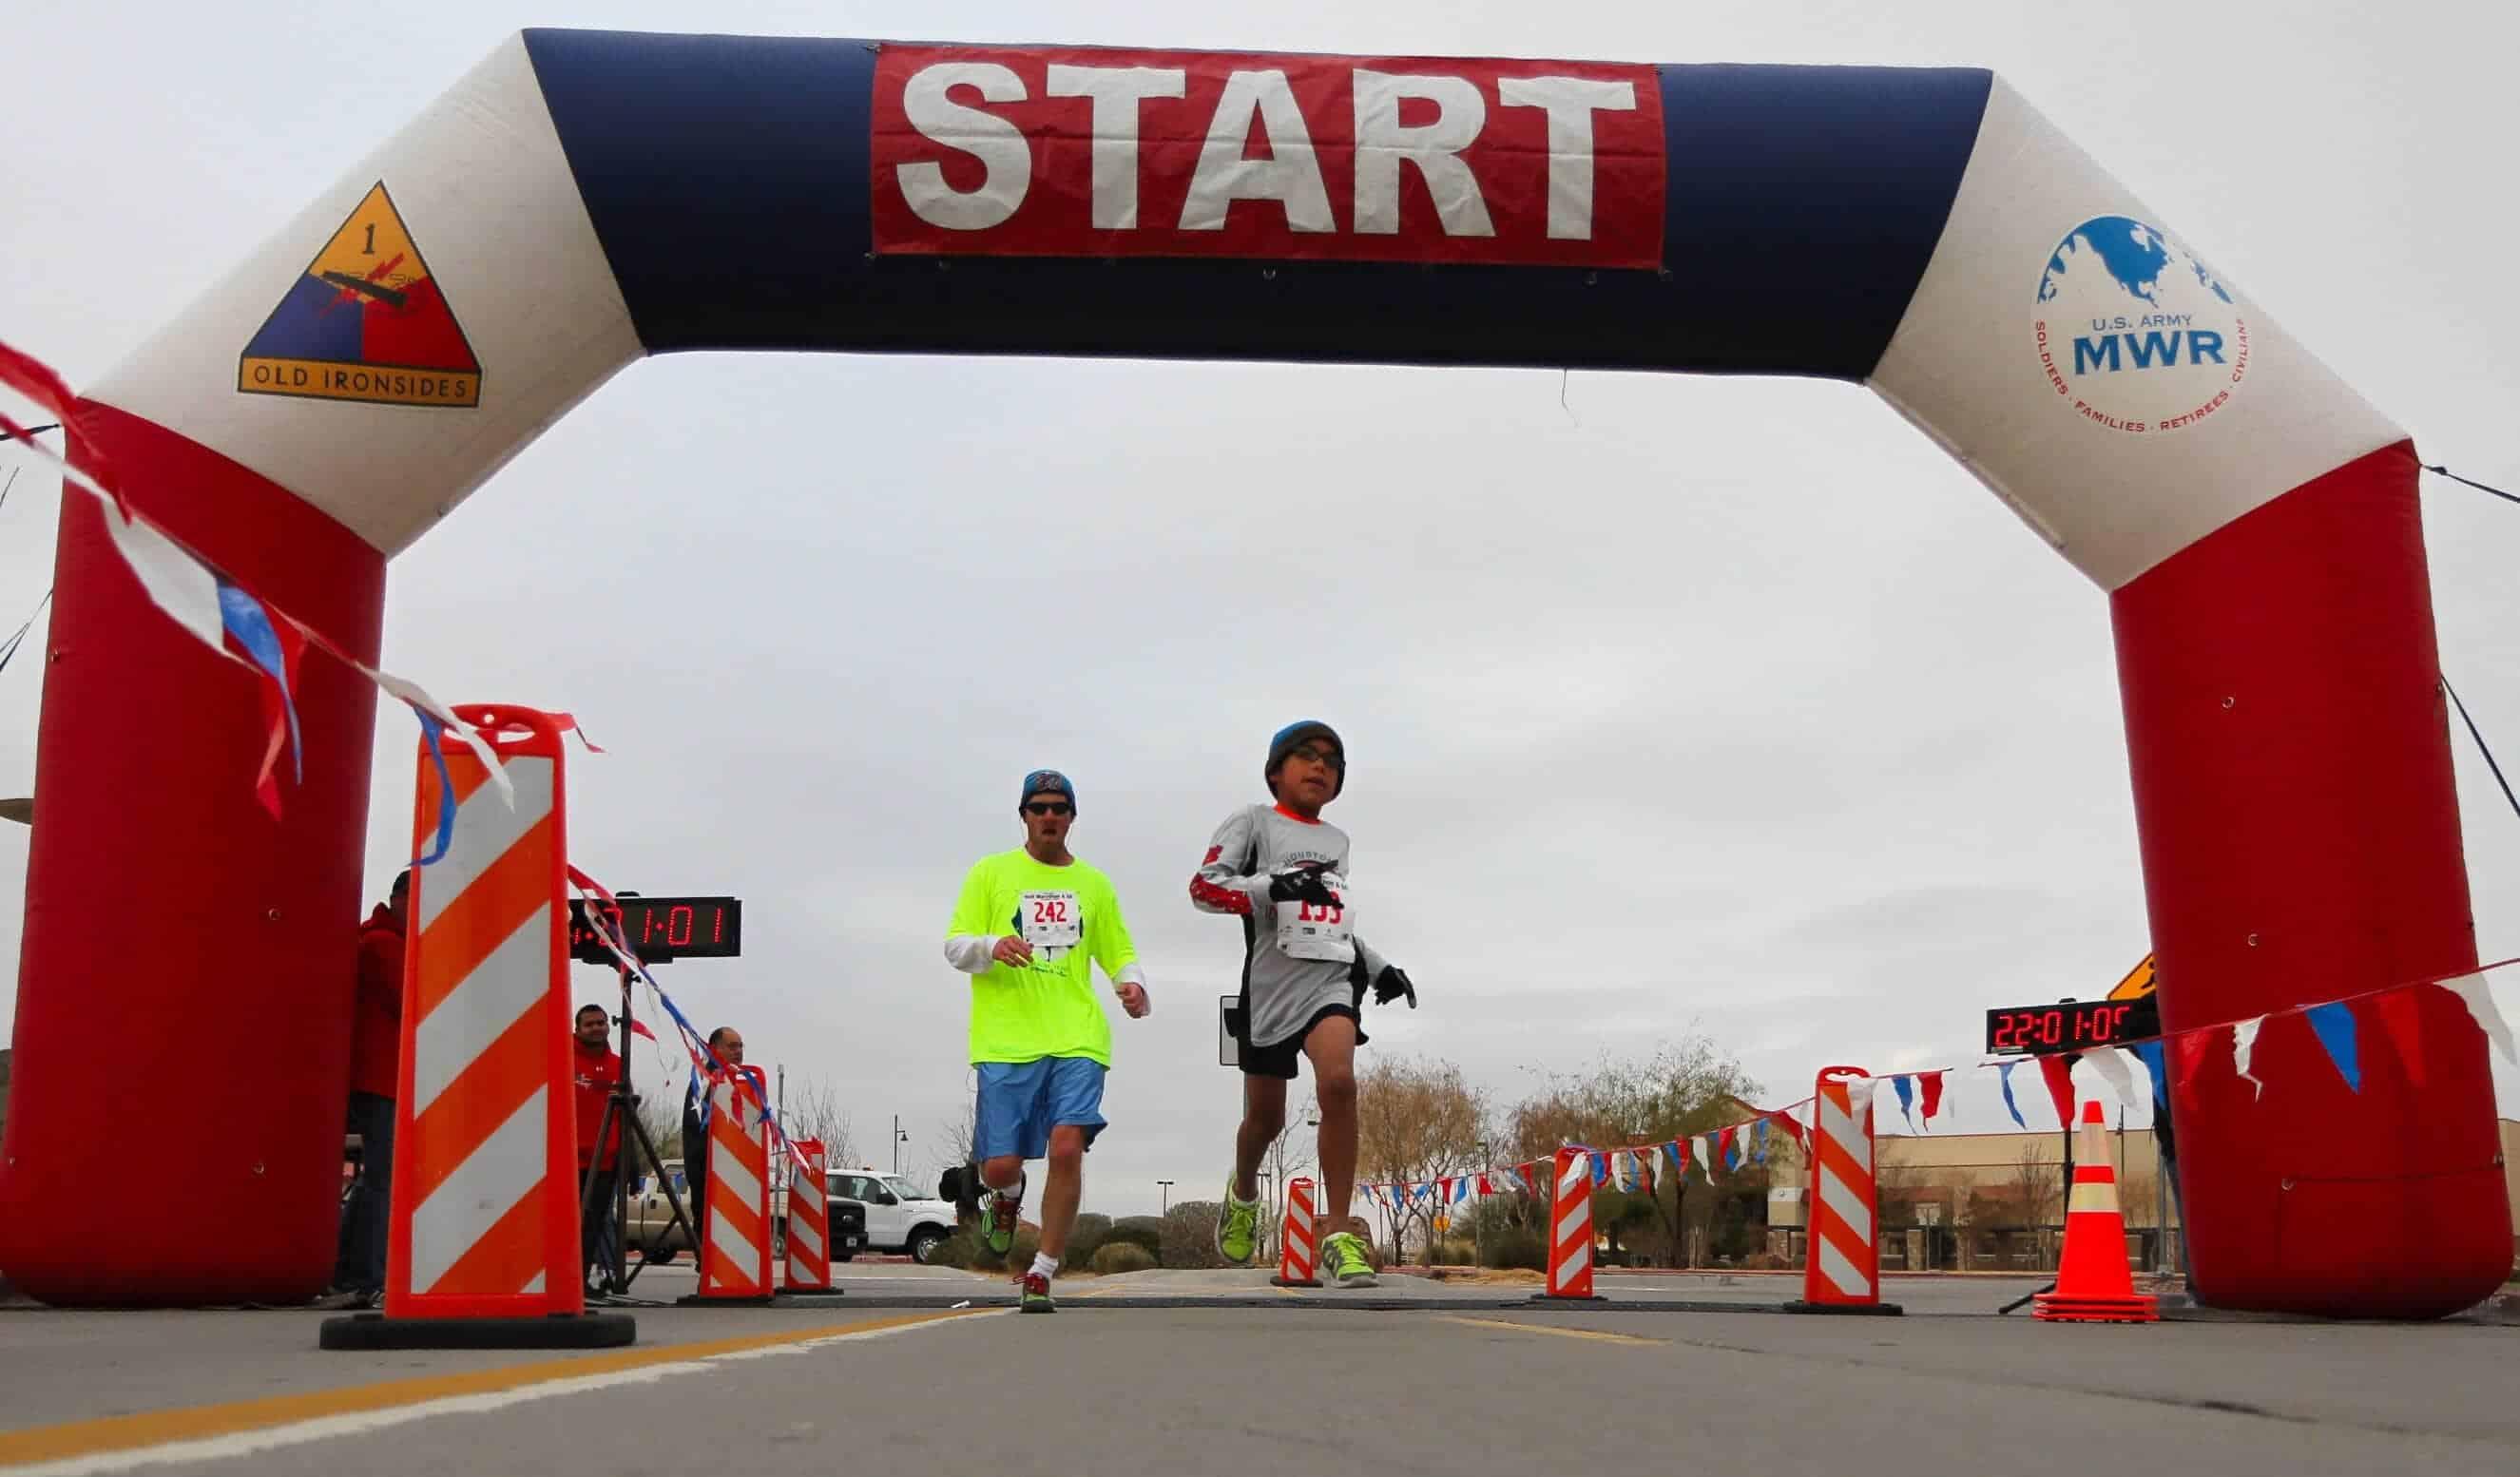 How To Build A Training Plan For Your Marathon or Half Marathon